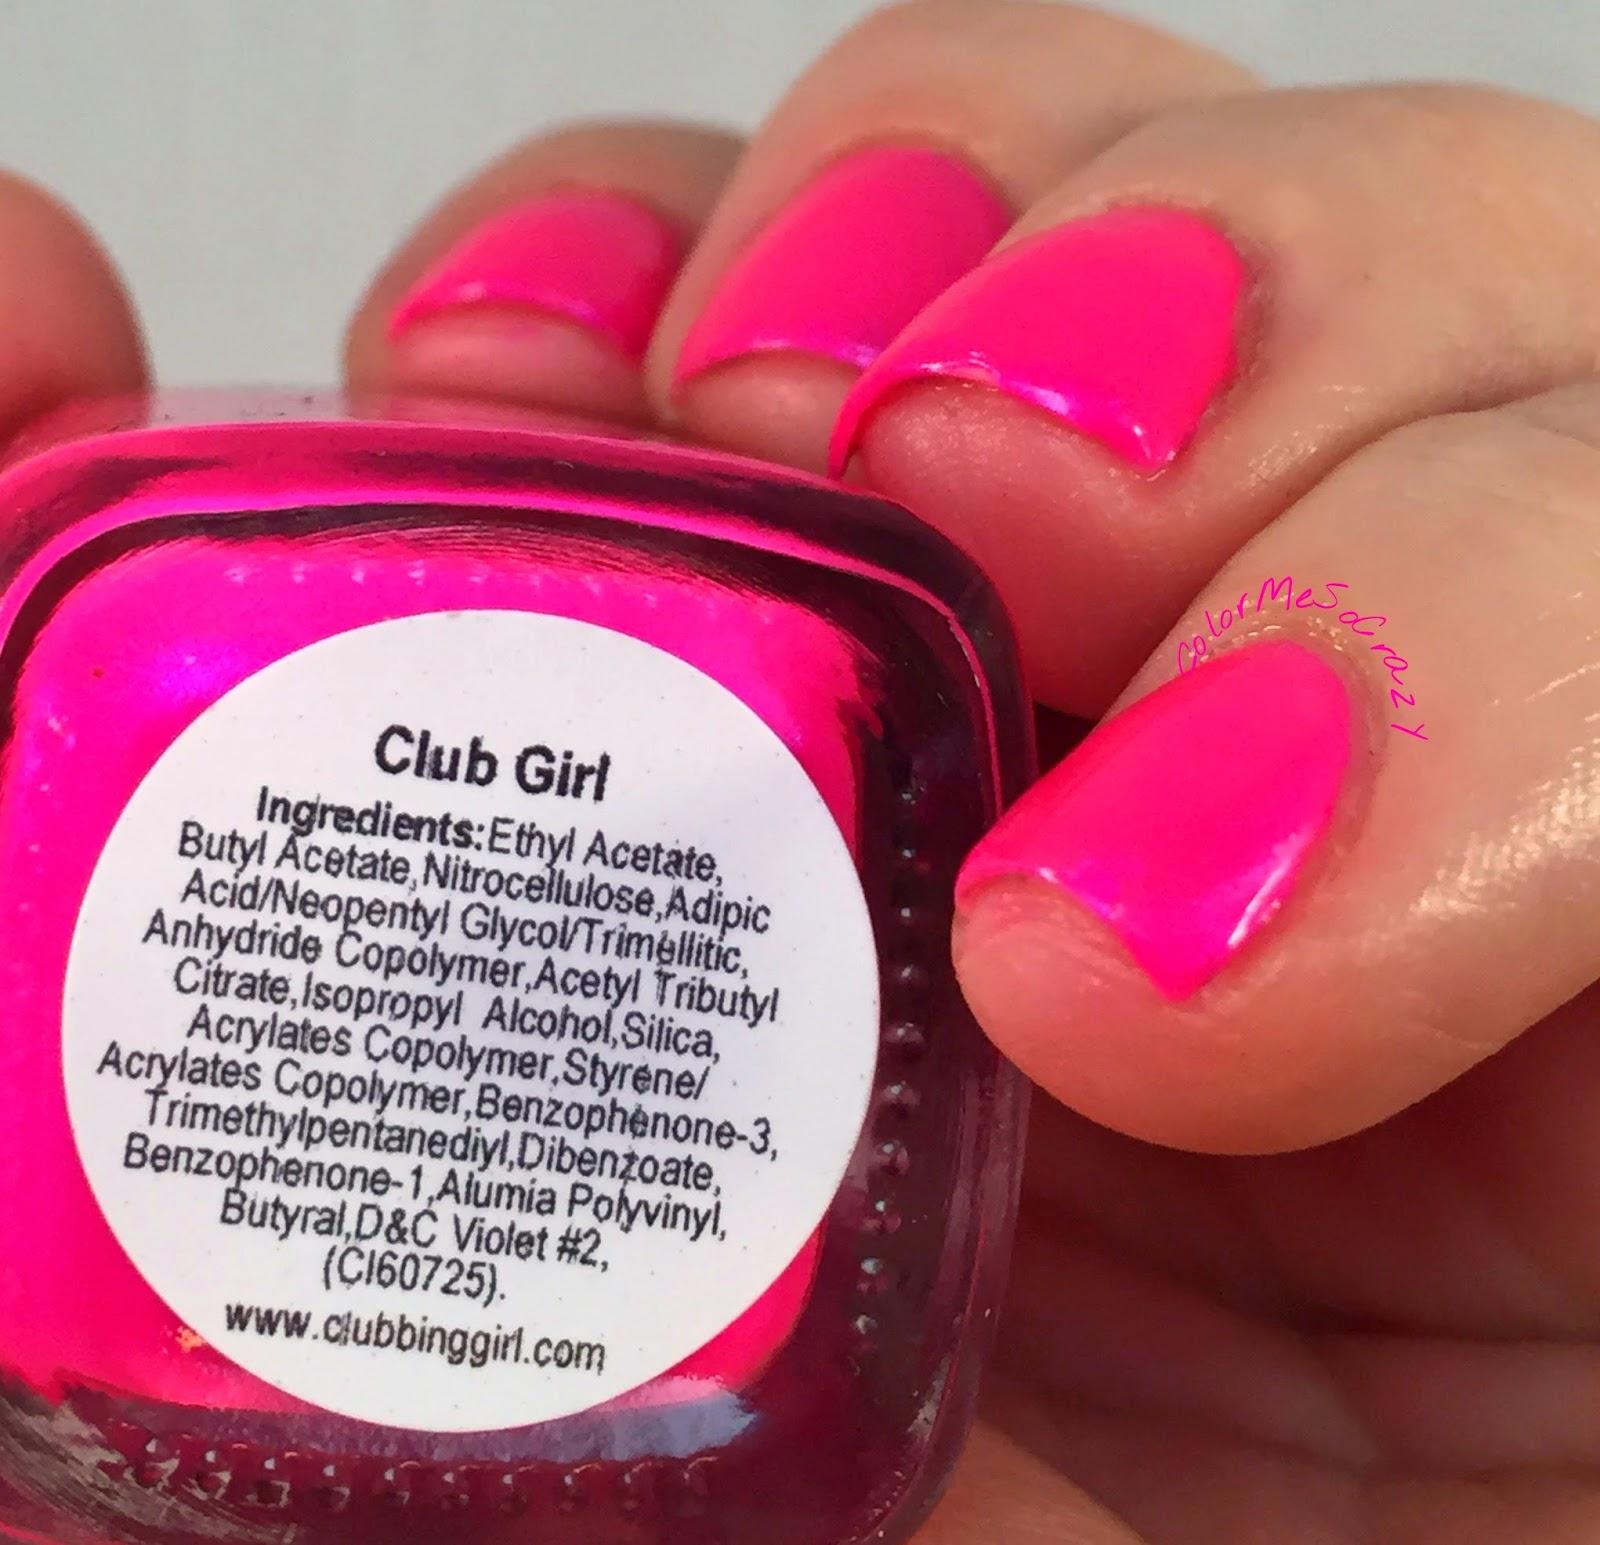 clubbing-girl-nail-polish, club-girl, hot-pink-nail-polish, stripper-nail-polish